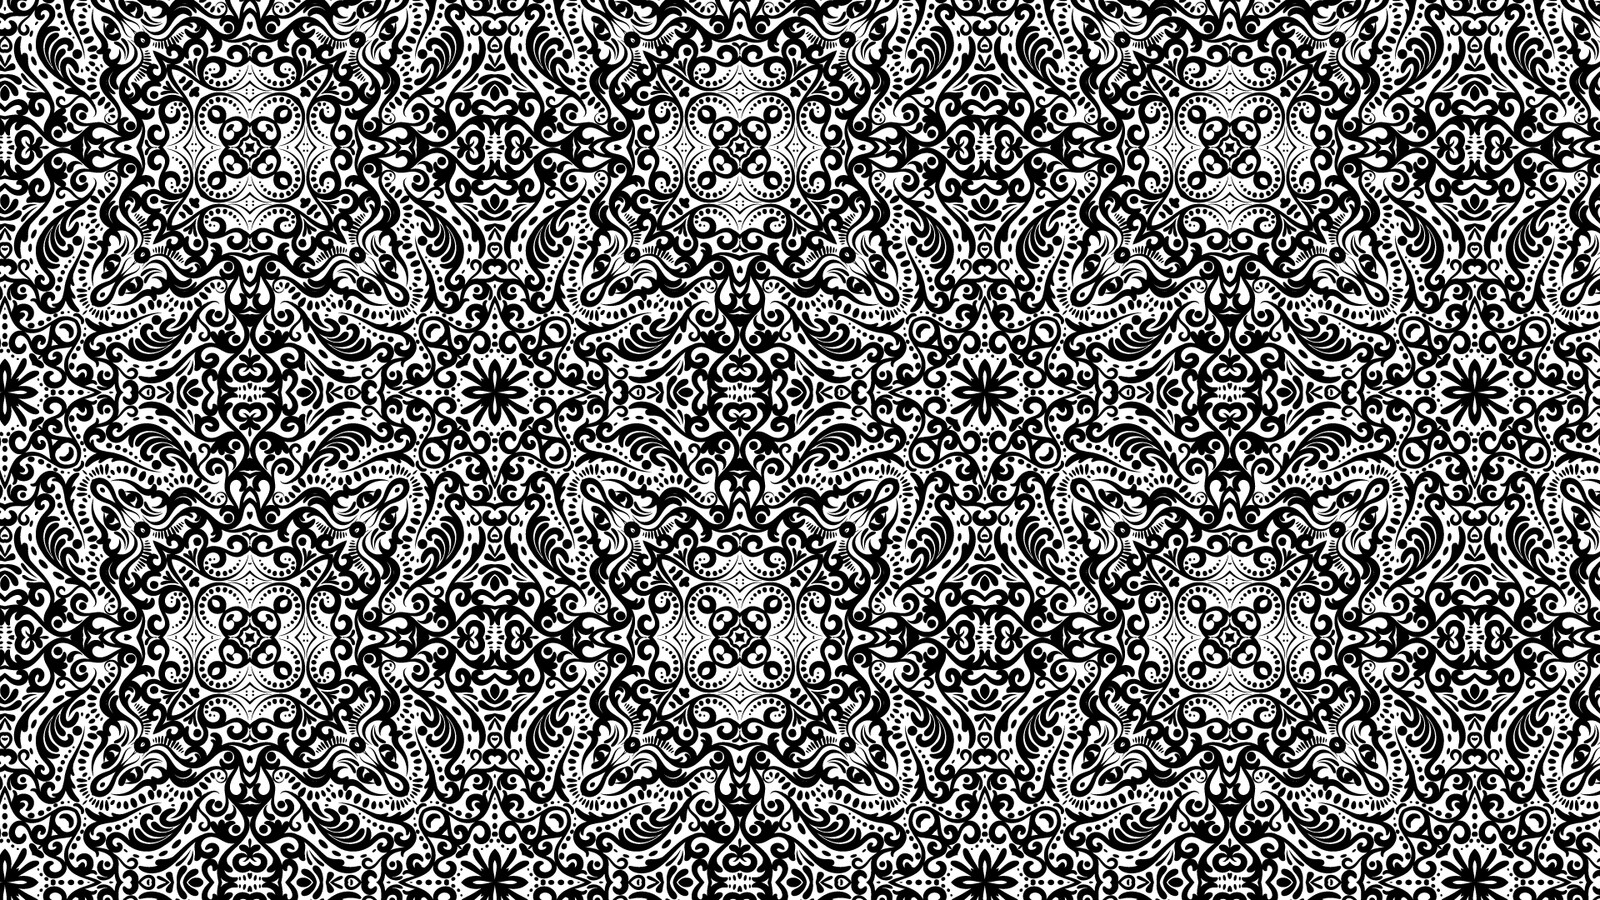 Vector Filigree Repeating Patterns